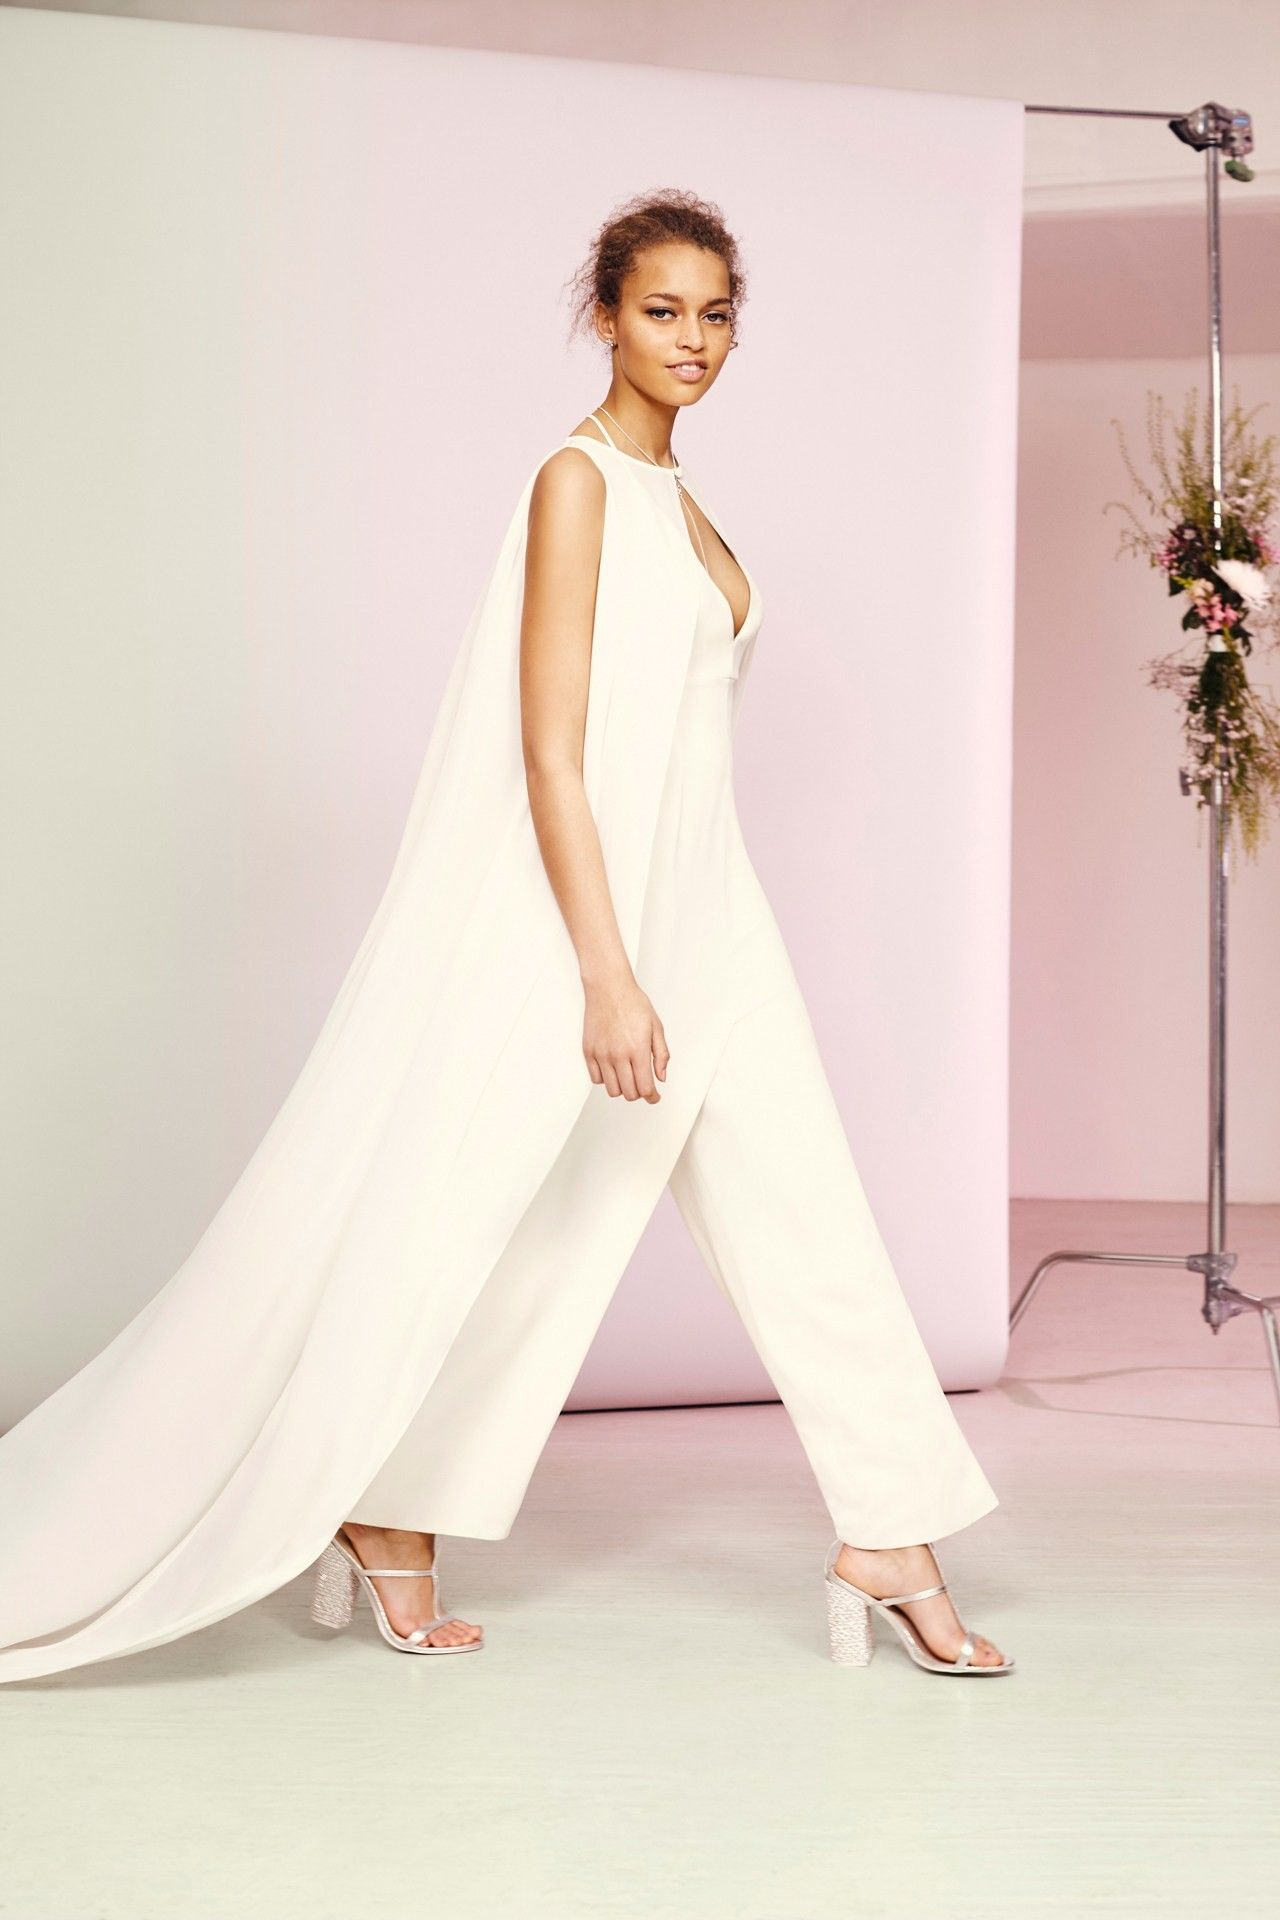 ASOS\'s New Wedding Dresses Look So Expensive | Wedding dress ...